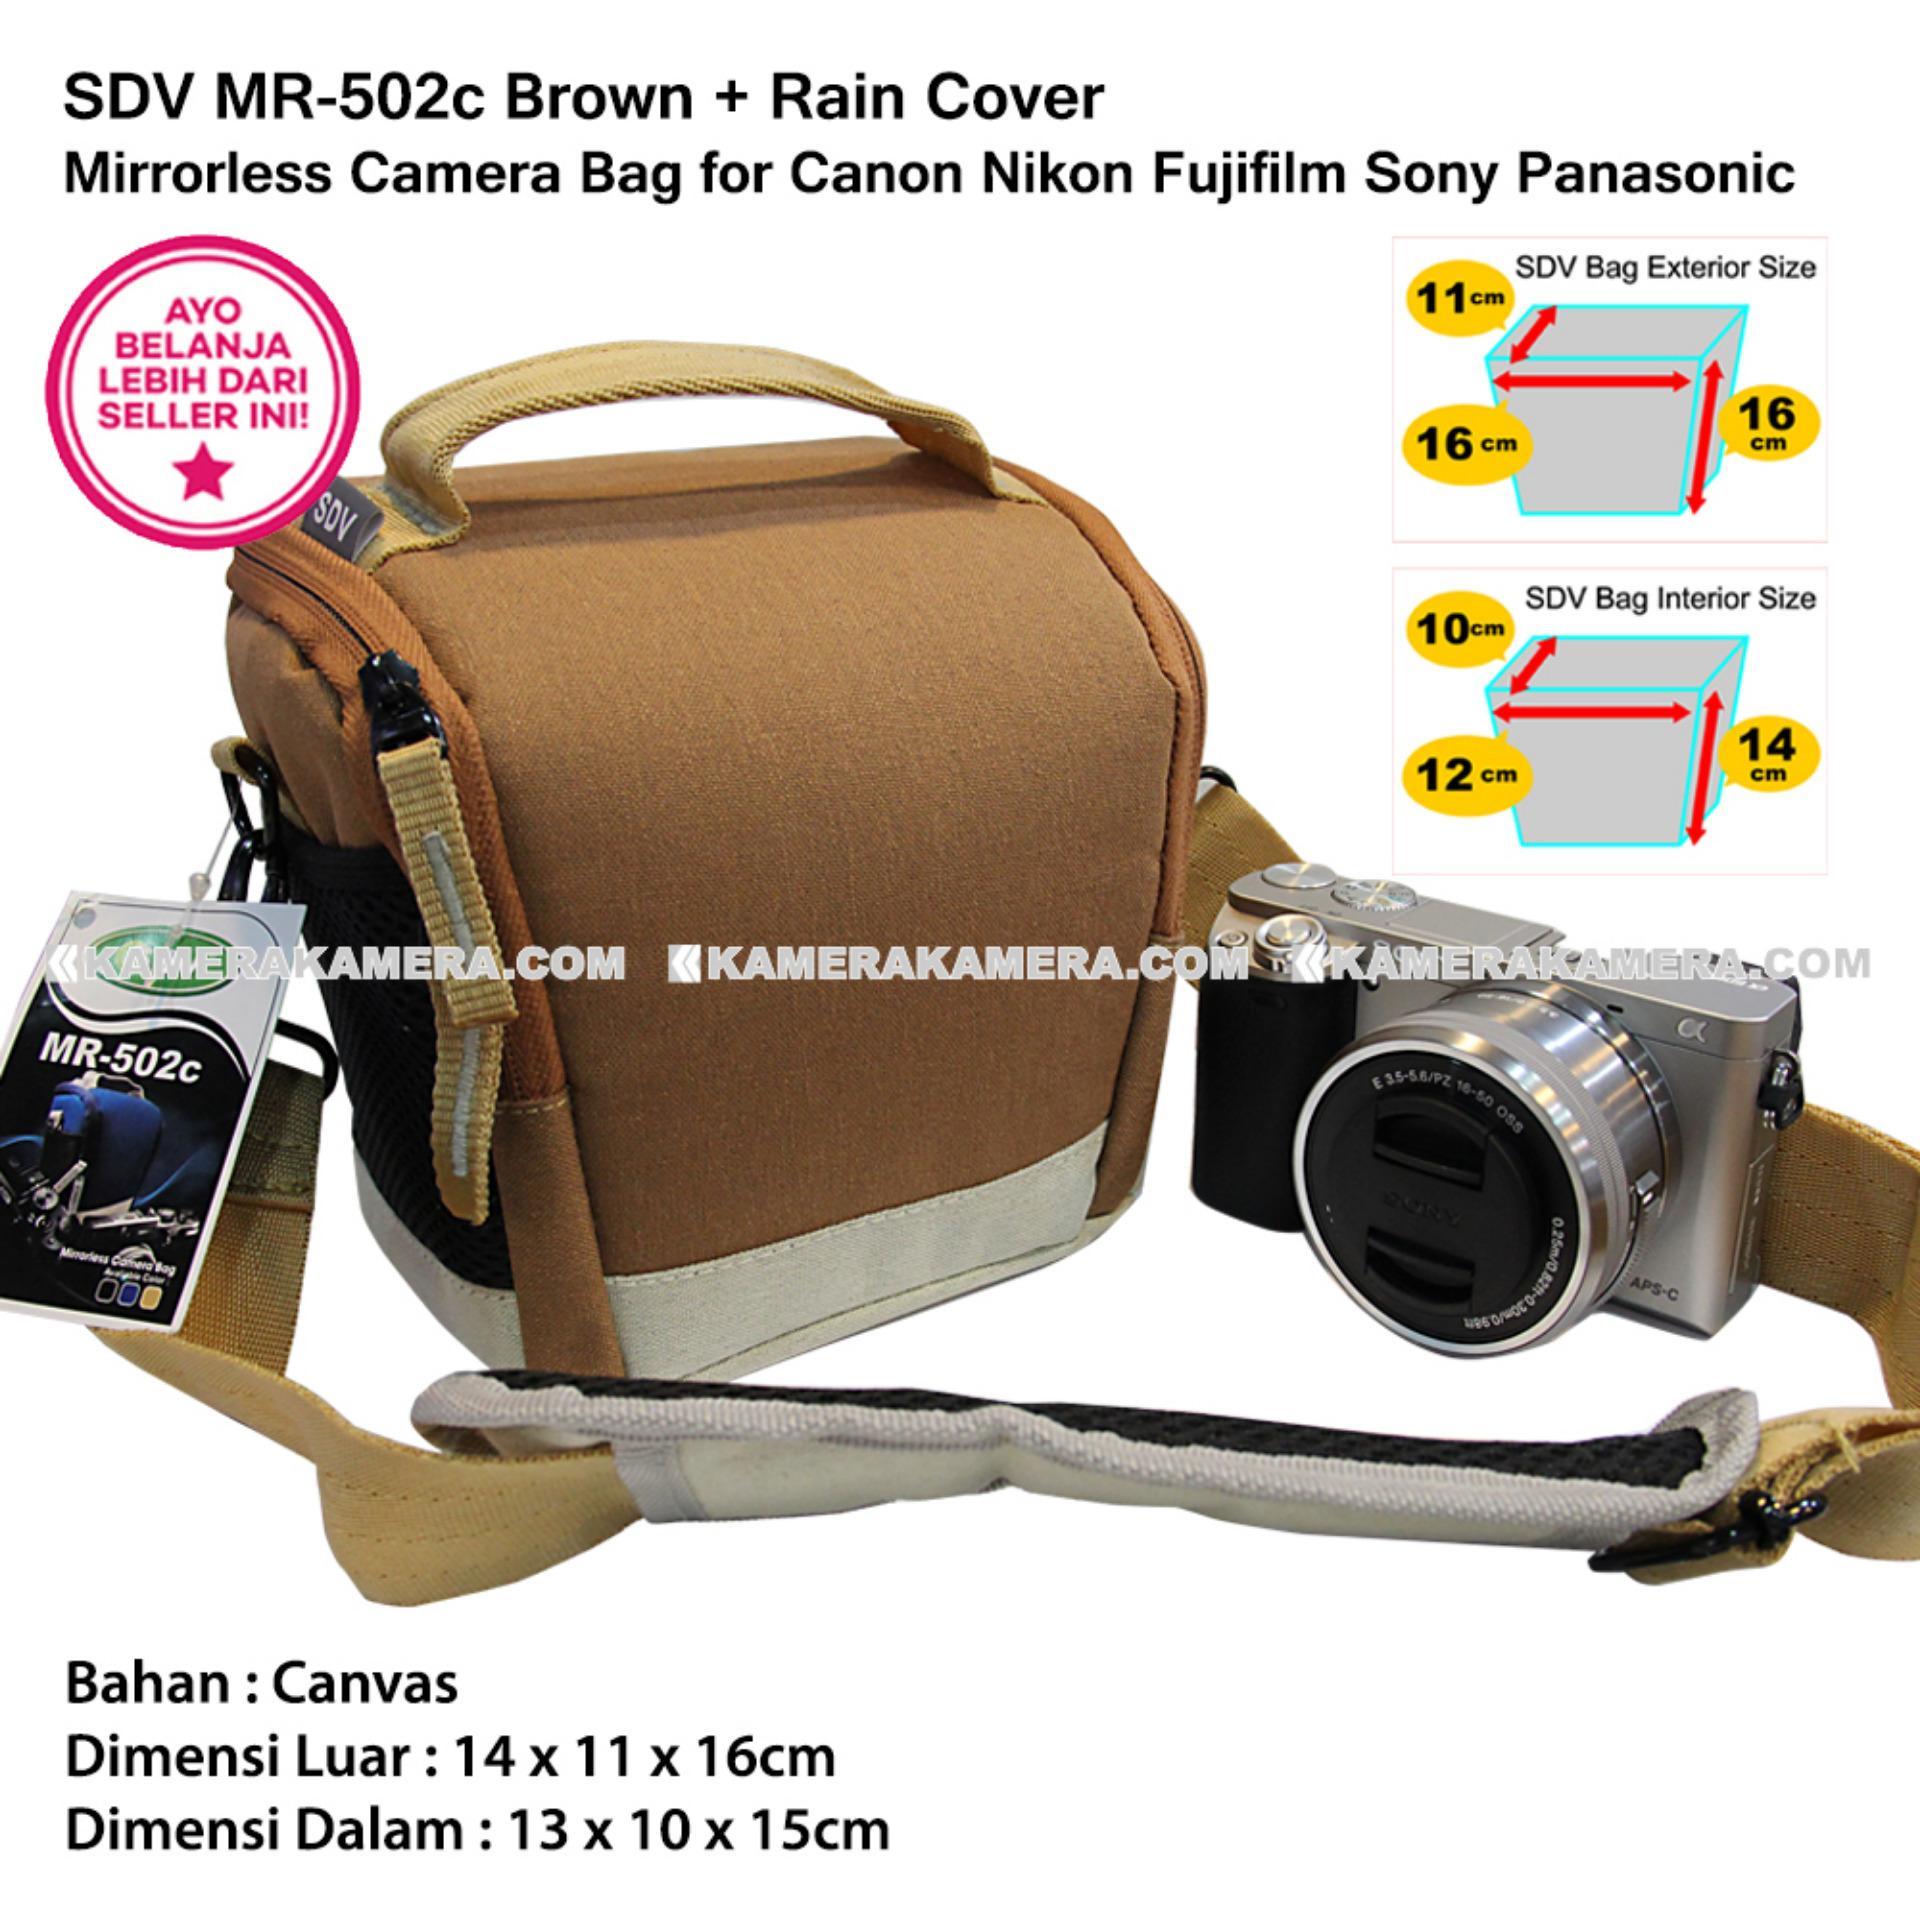 SDV MR-502c Brown Canvas Bag with Rain Cover Tas Kamera Mirrorless Canon Nikon Sony